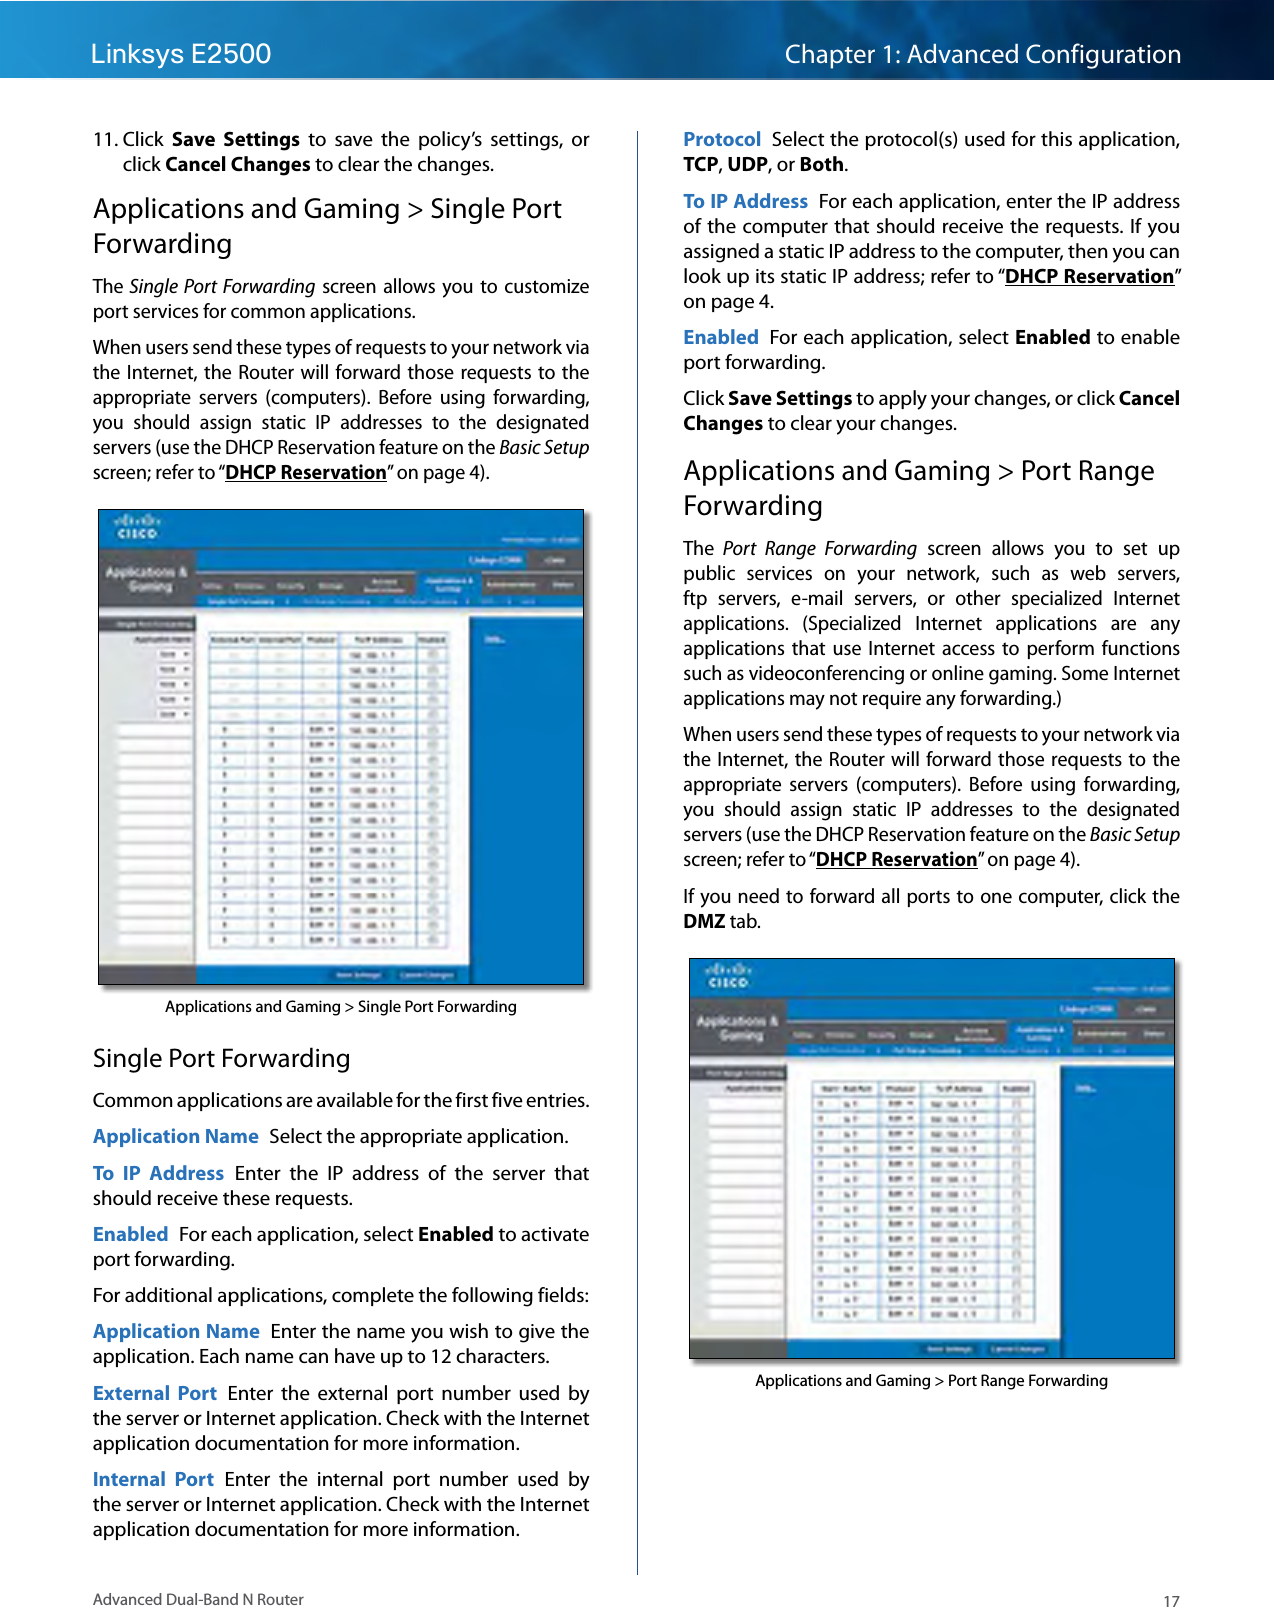 cisco linksys e2500 manual pdf